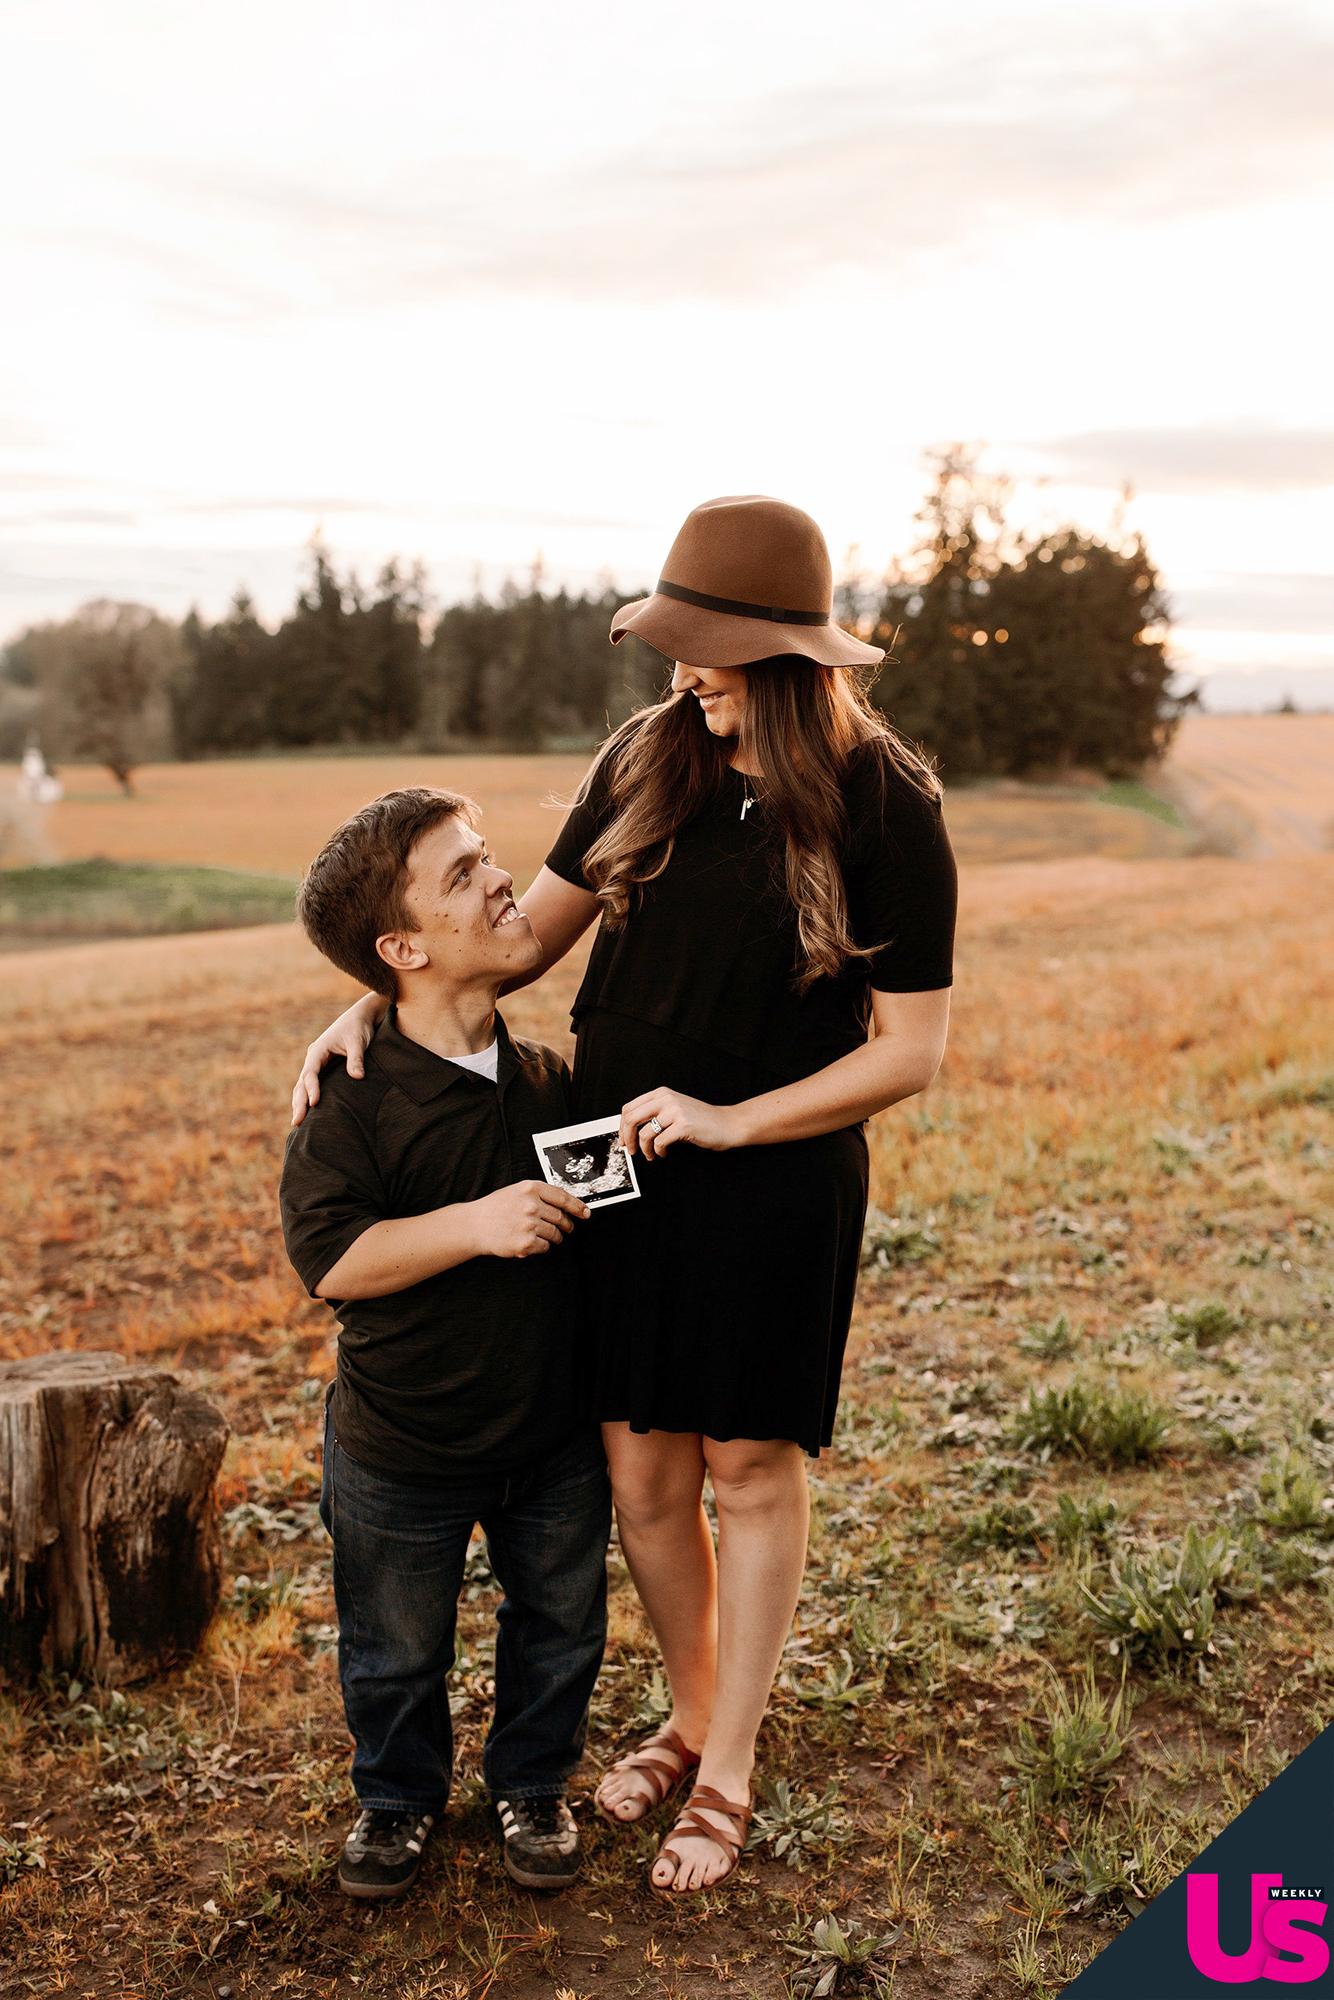 Zach-and-Tori-Roloff-pregnancy-announcement